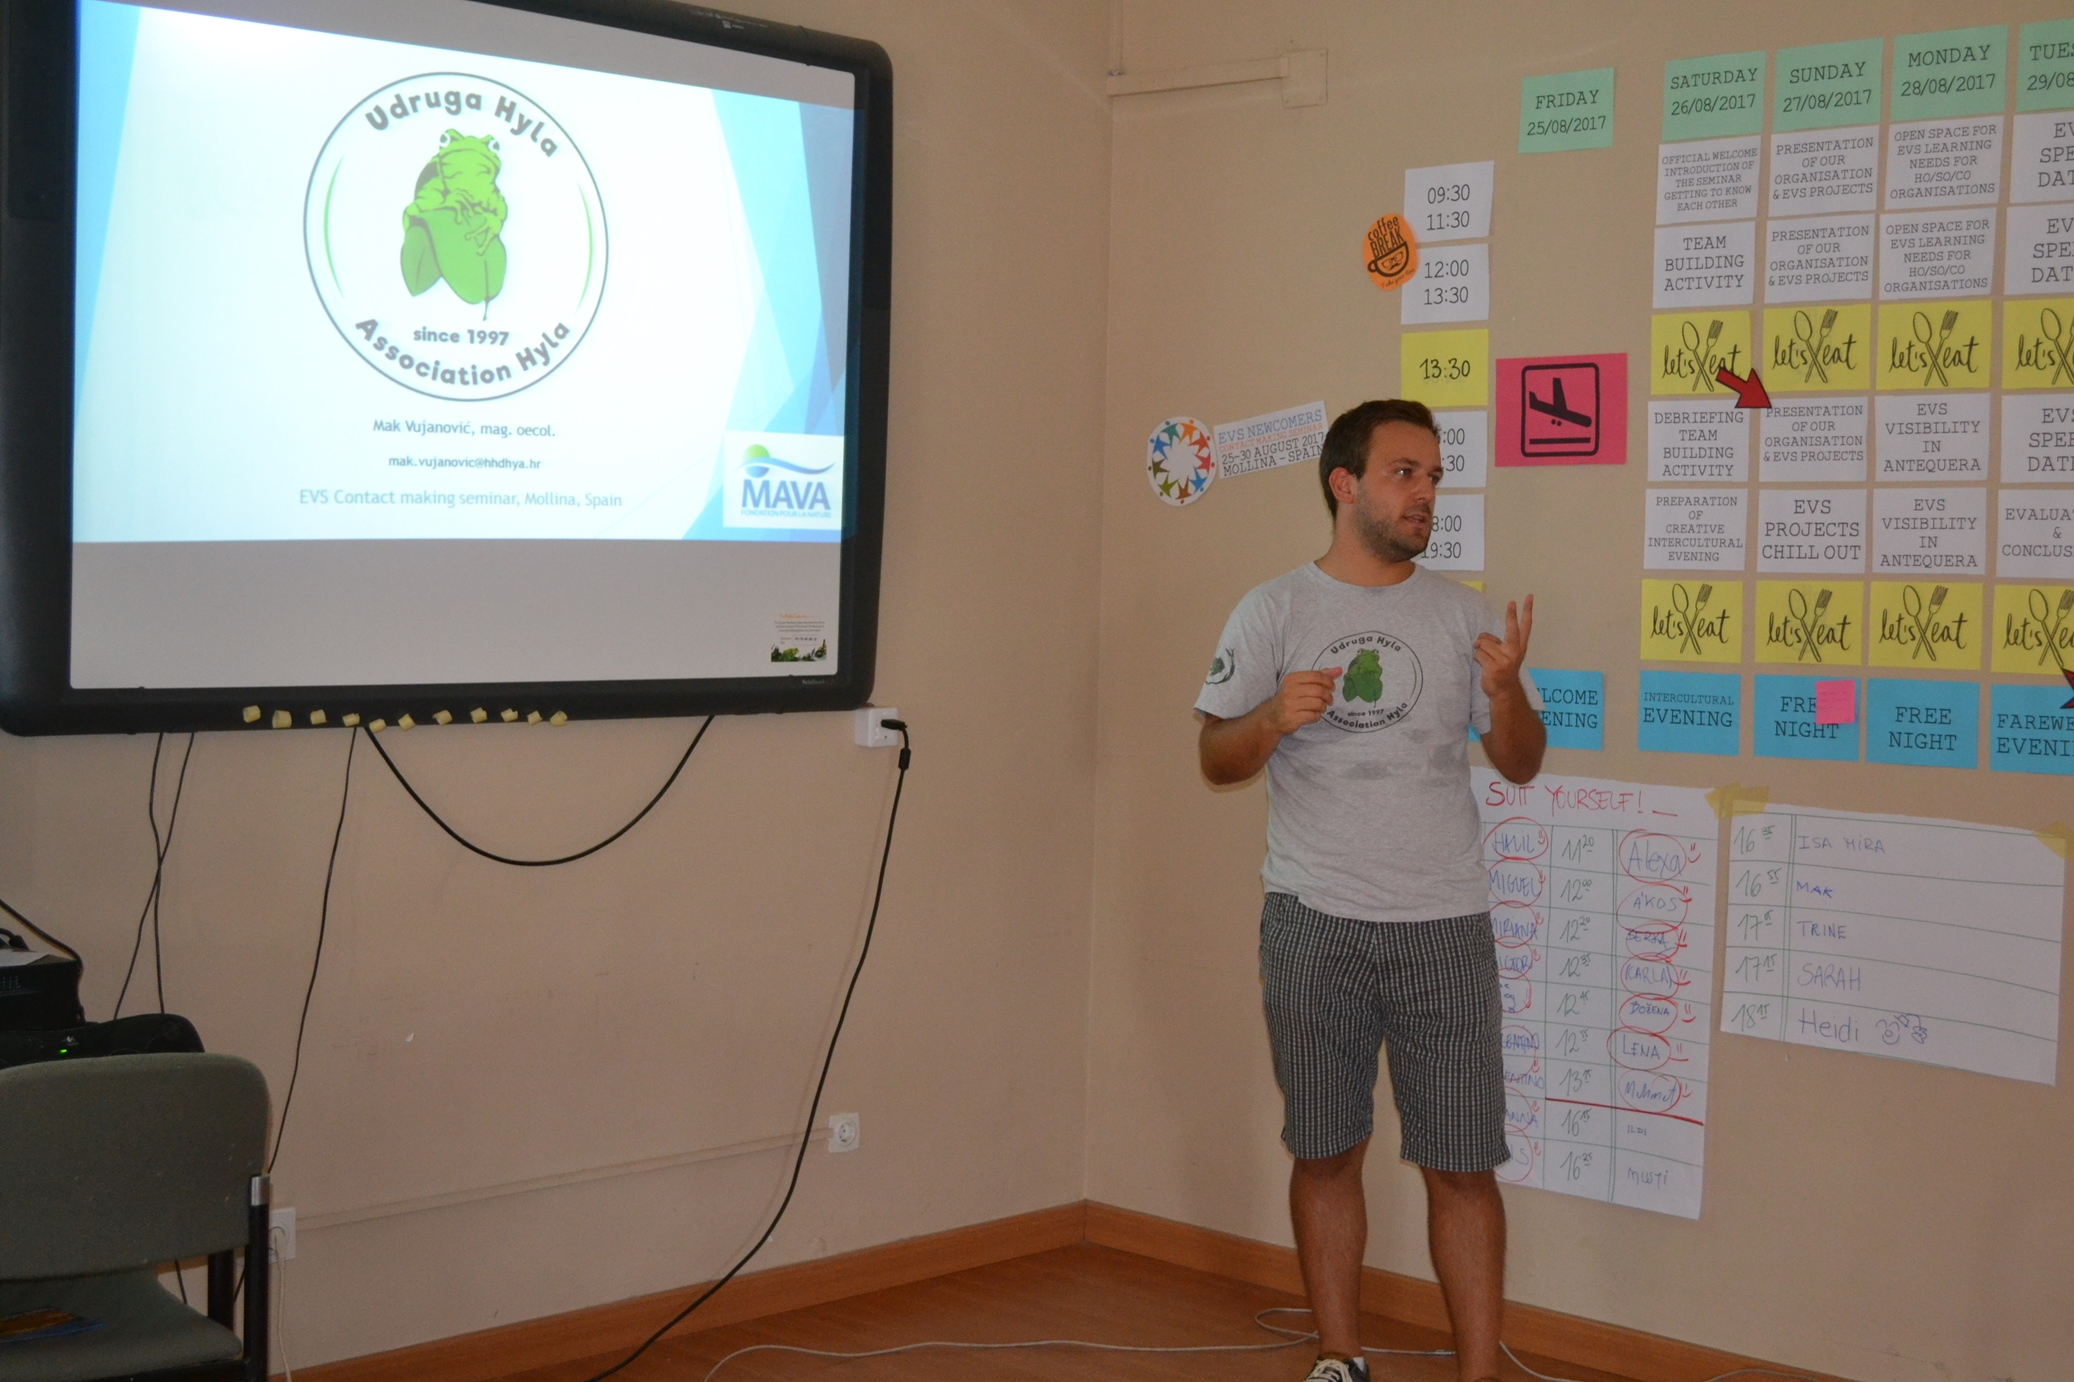 EVS prezentacija